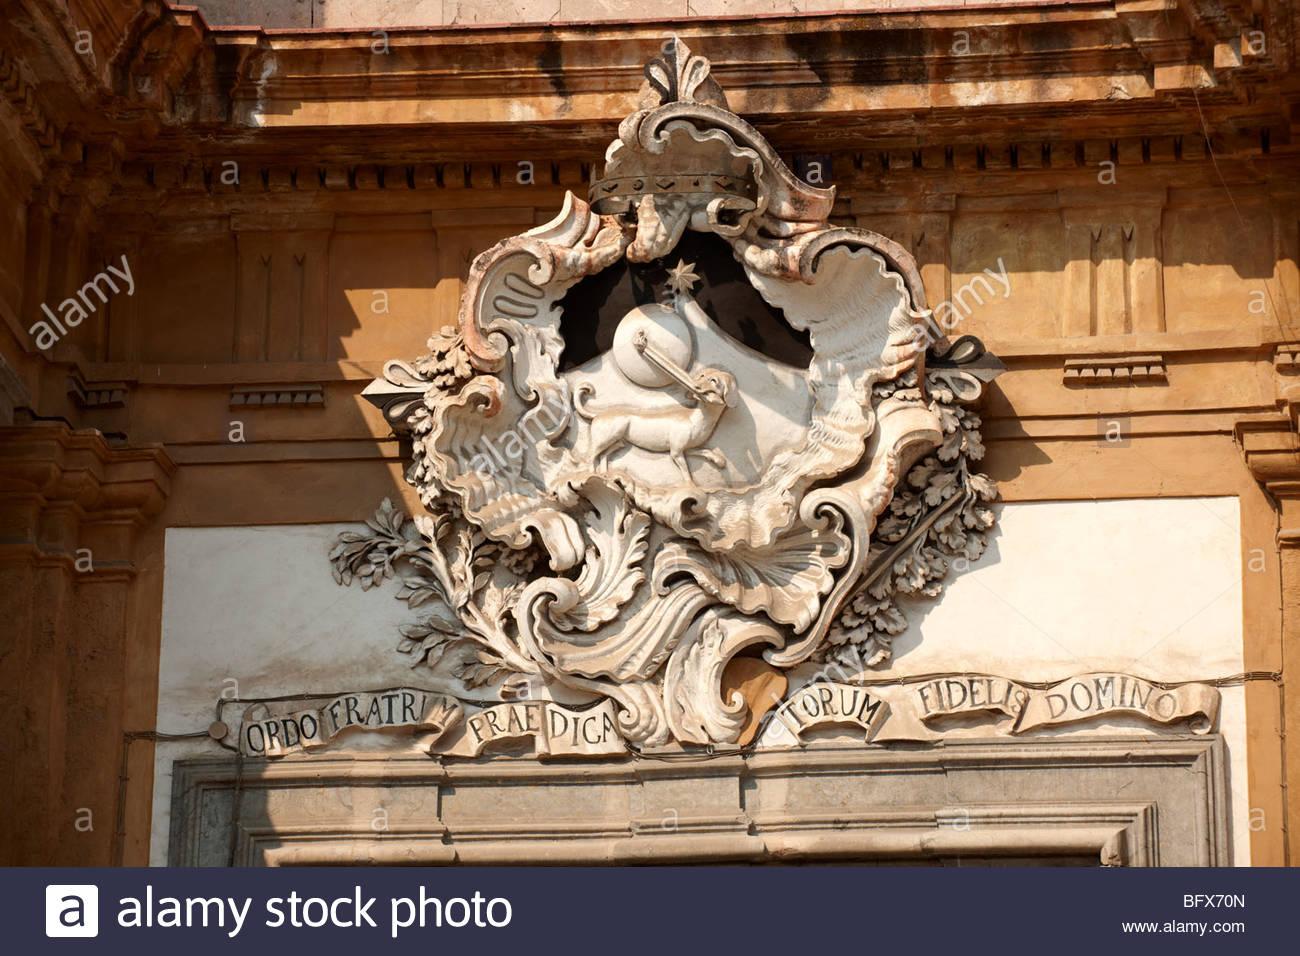 Barocke Skulpturen, architektonische Dekoration, Palermo Sizilien Stockbild